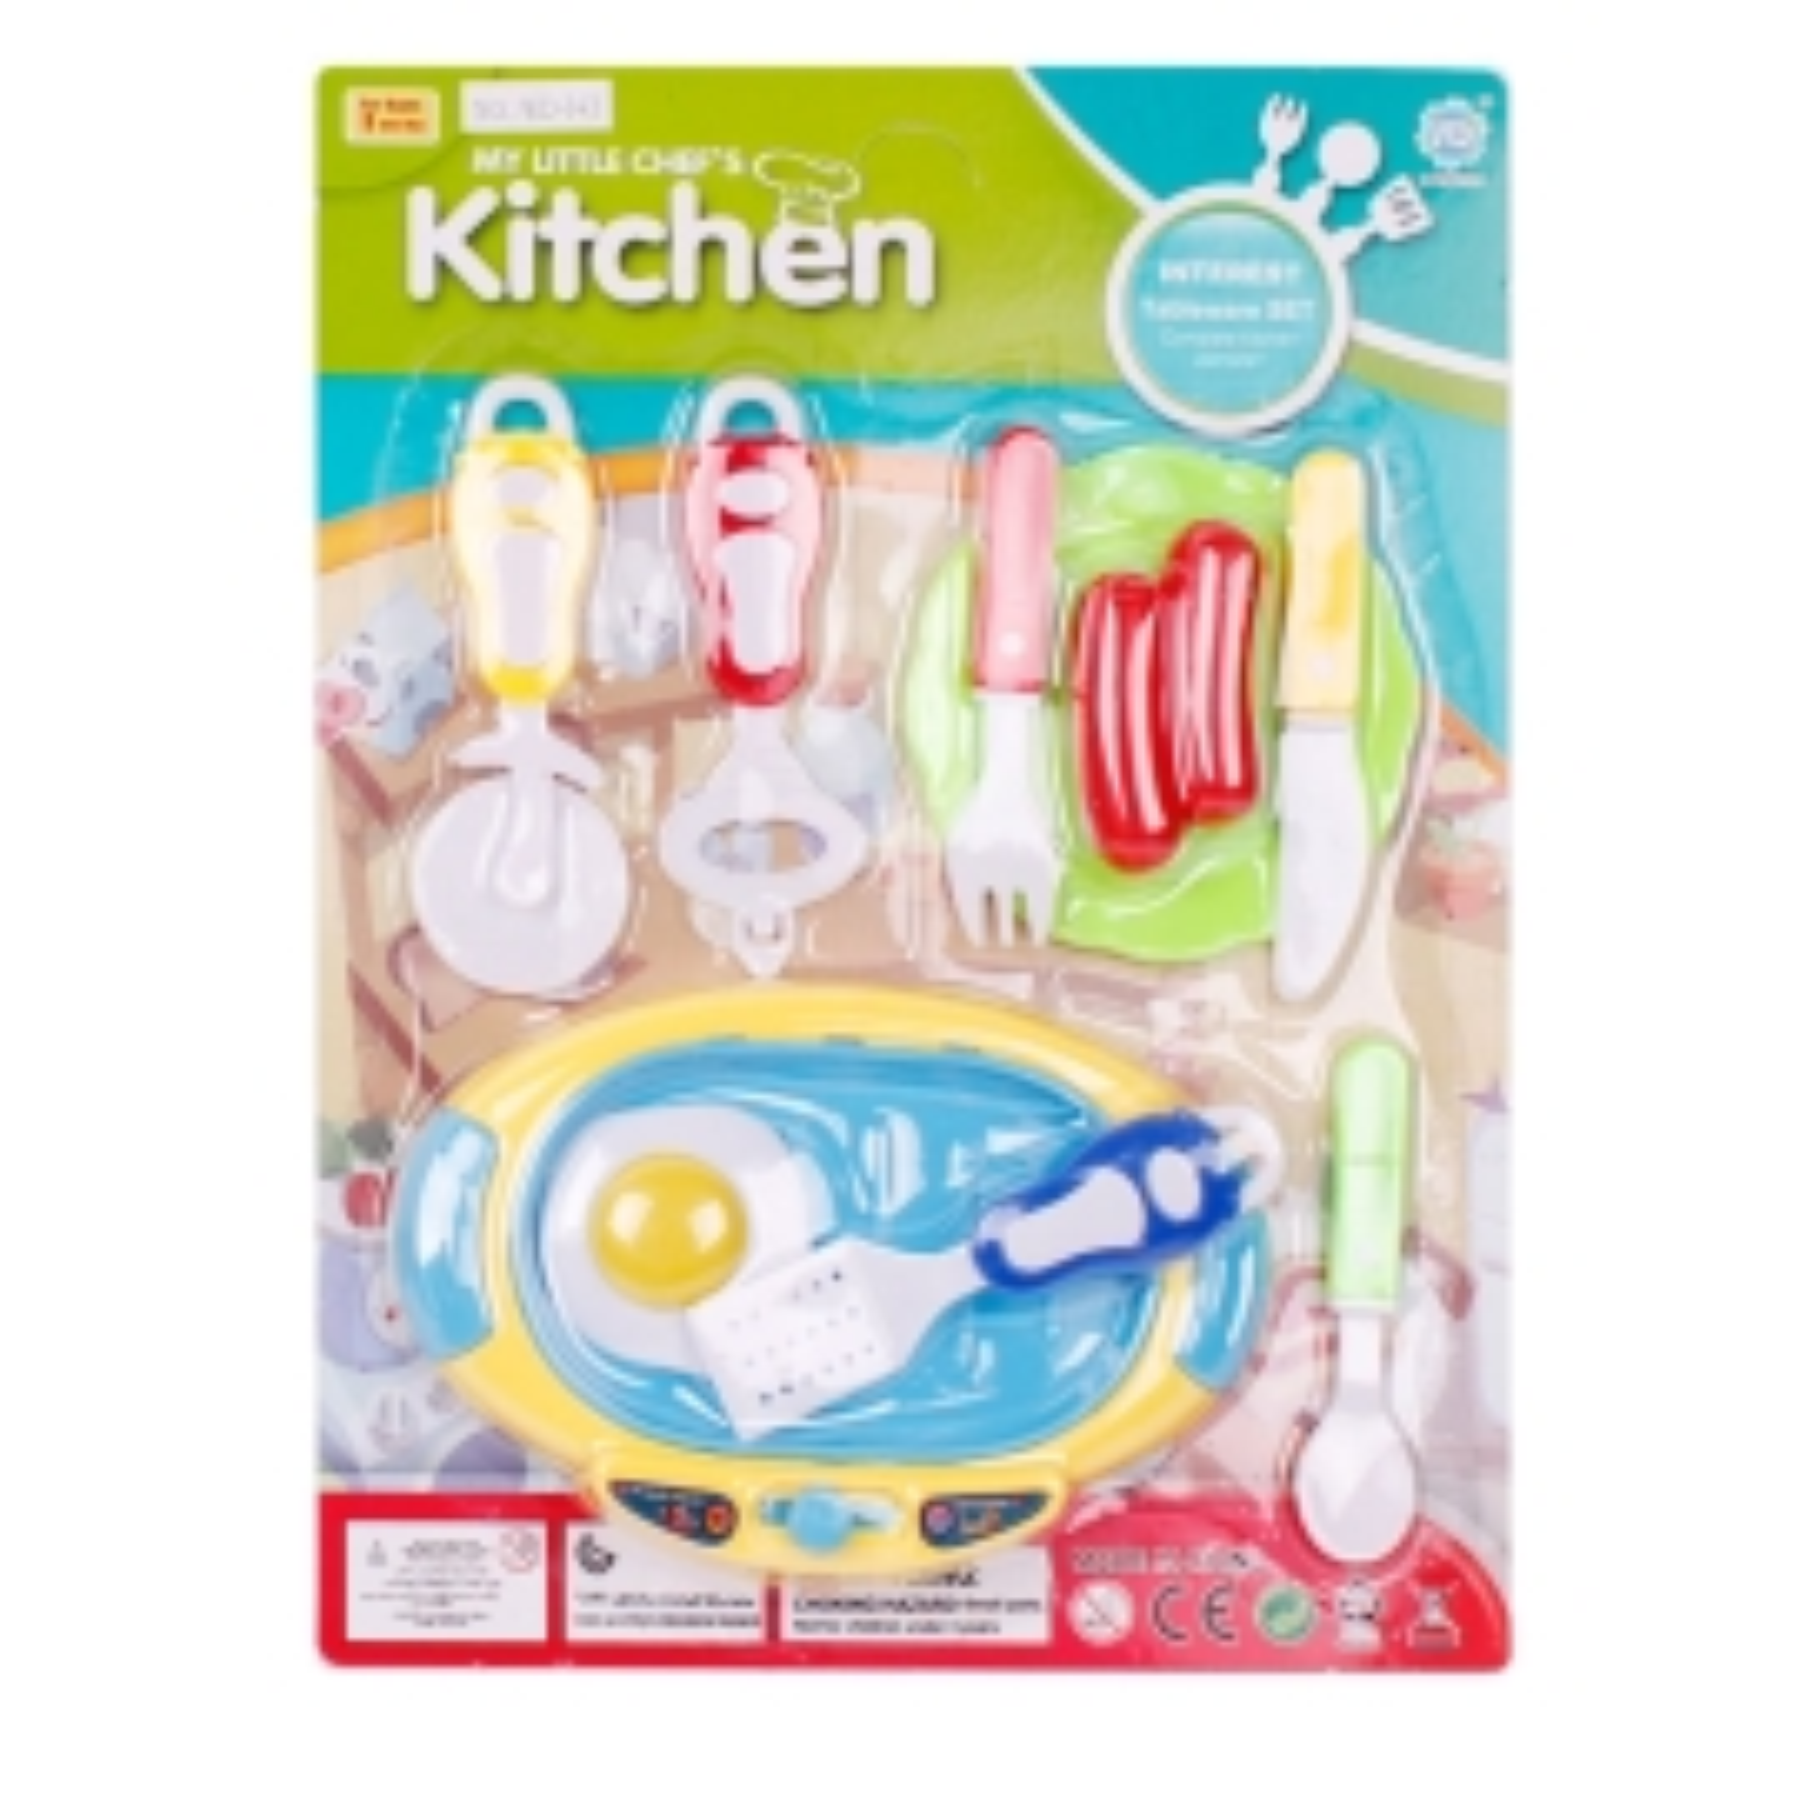 Набор посудки кухня в блистере 100997050 (4754)